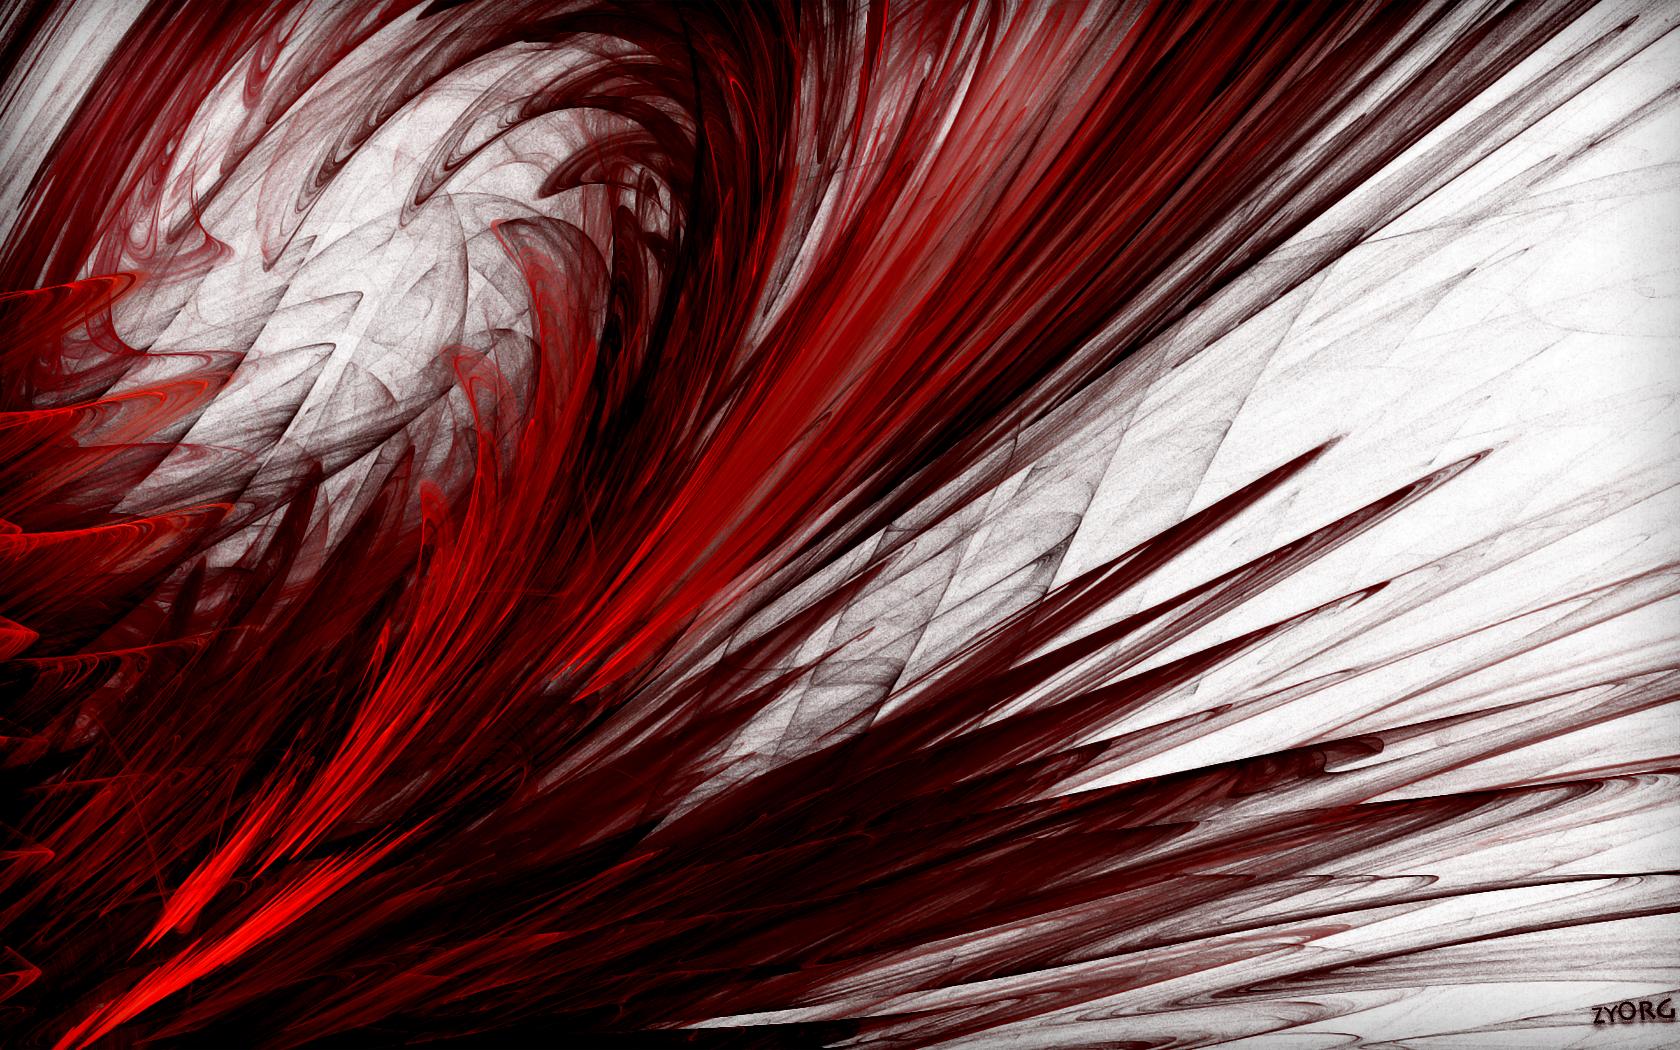 Blood Splatter by zy0rg on DeviantArt